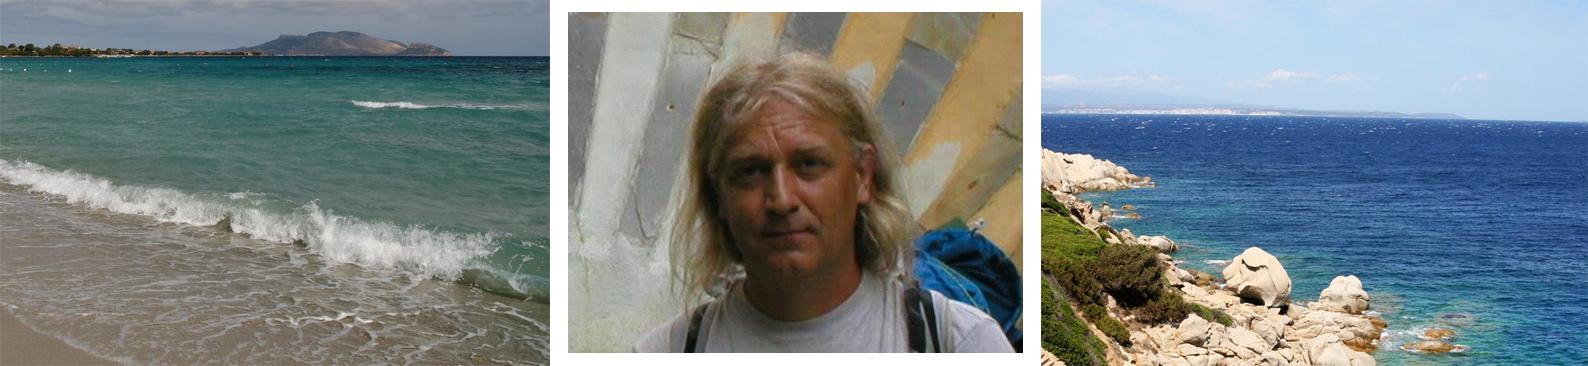 Georg Stockhorst